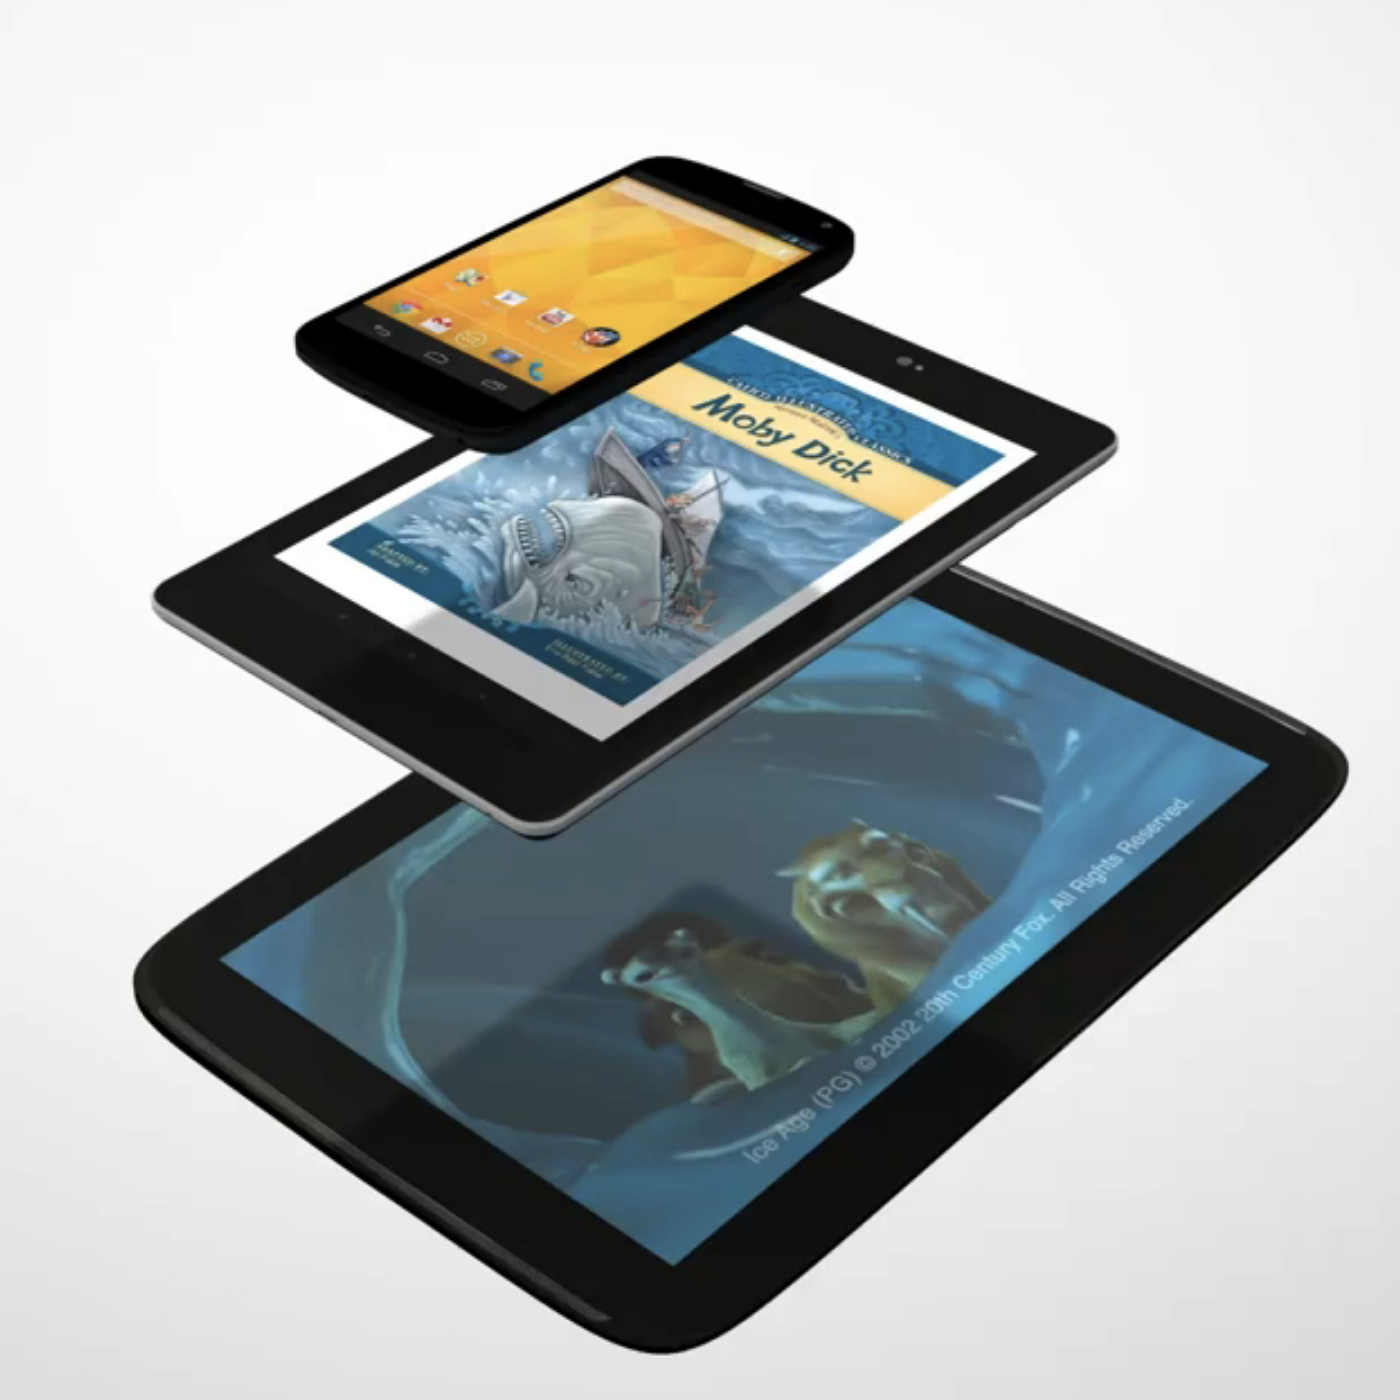 Google Nexus Playground - Google Nexus 5, 7, 10 global digital campaign. Production, Art Direction and UX Design.